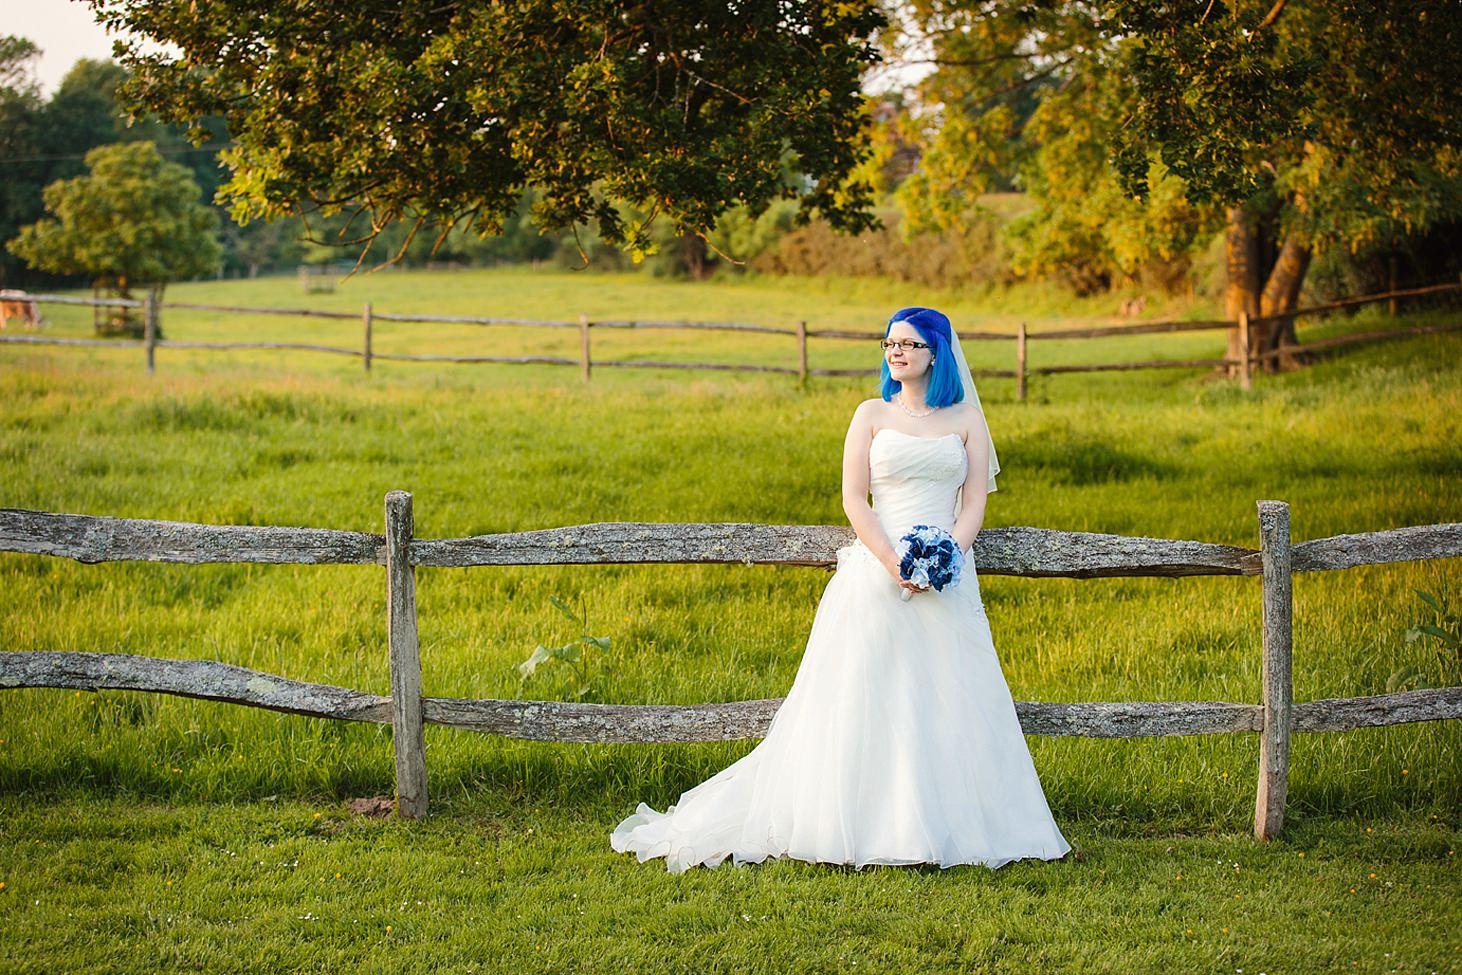 gate street barn wedding photography bride by fence